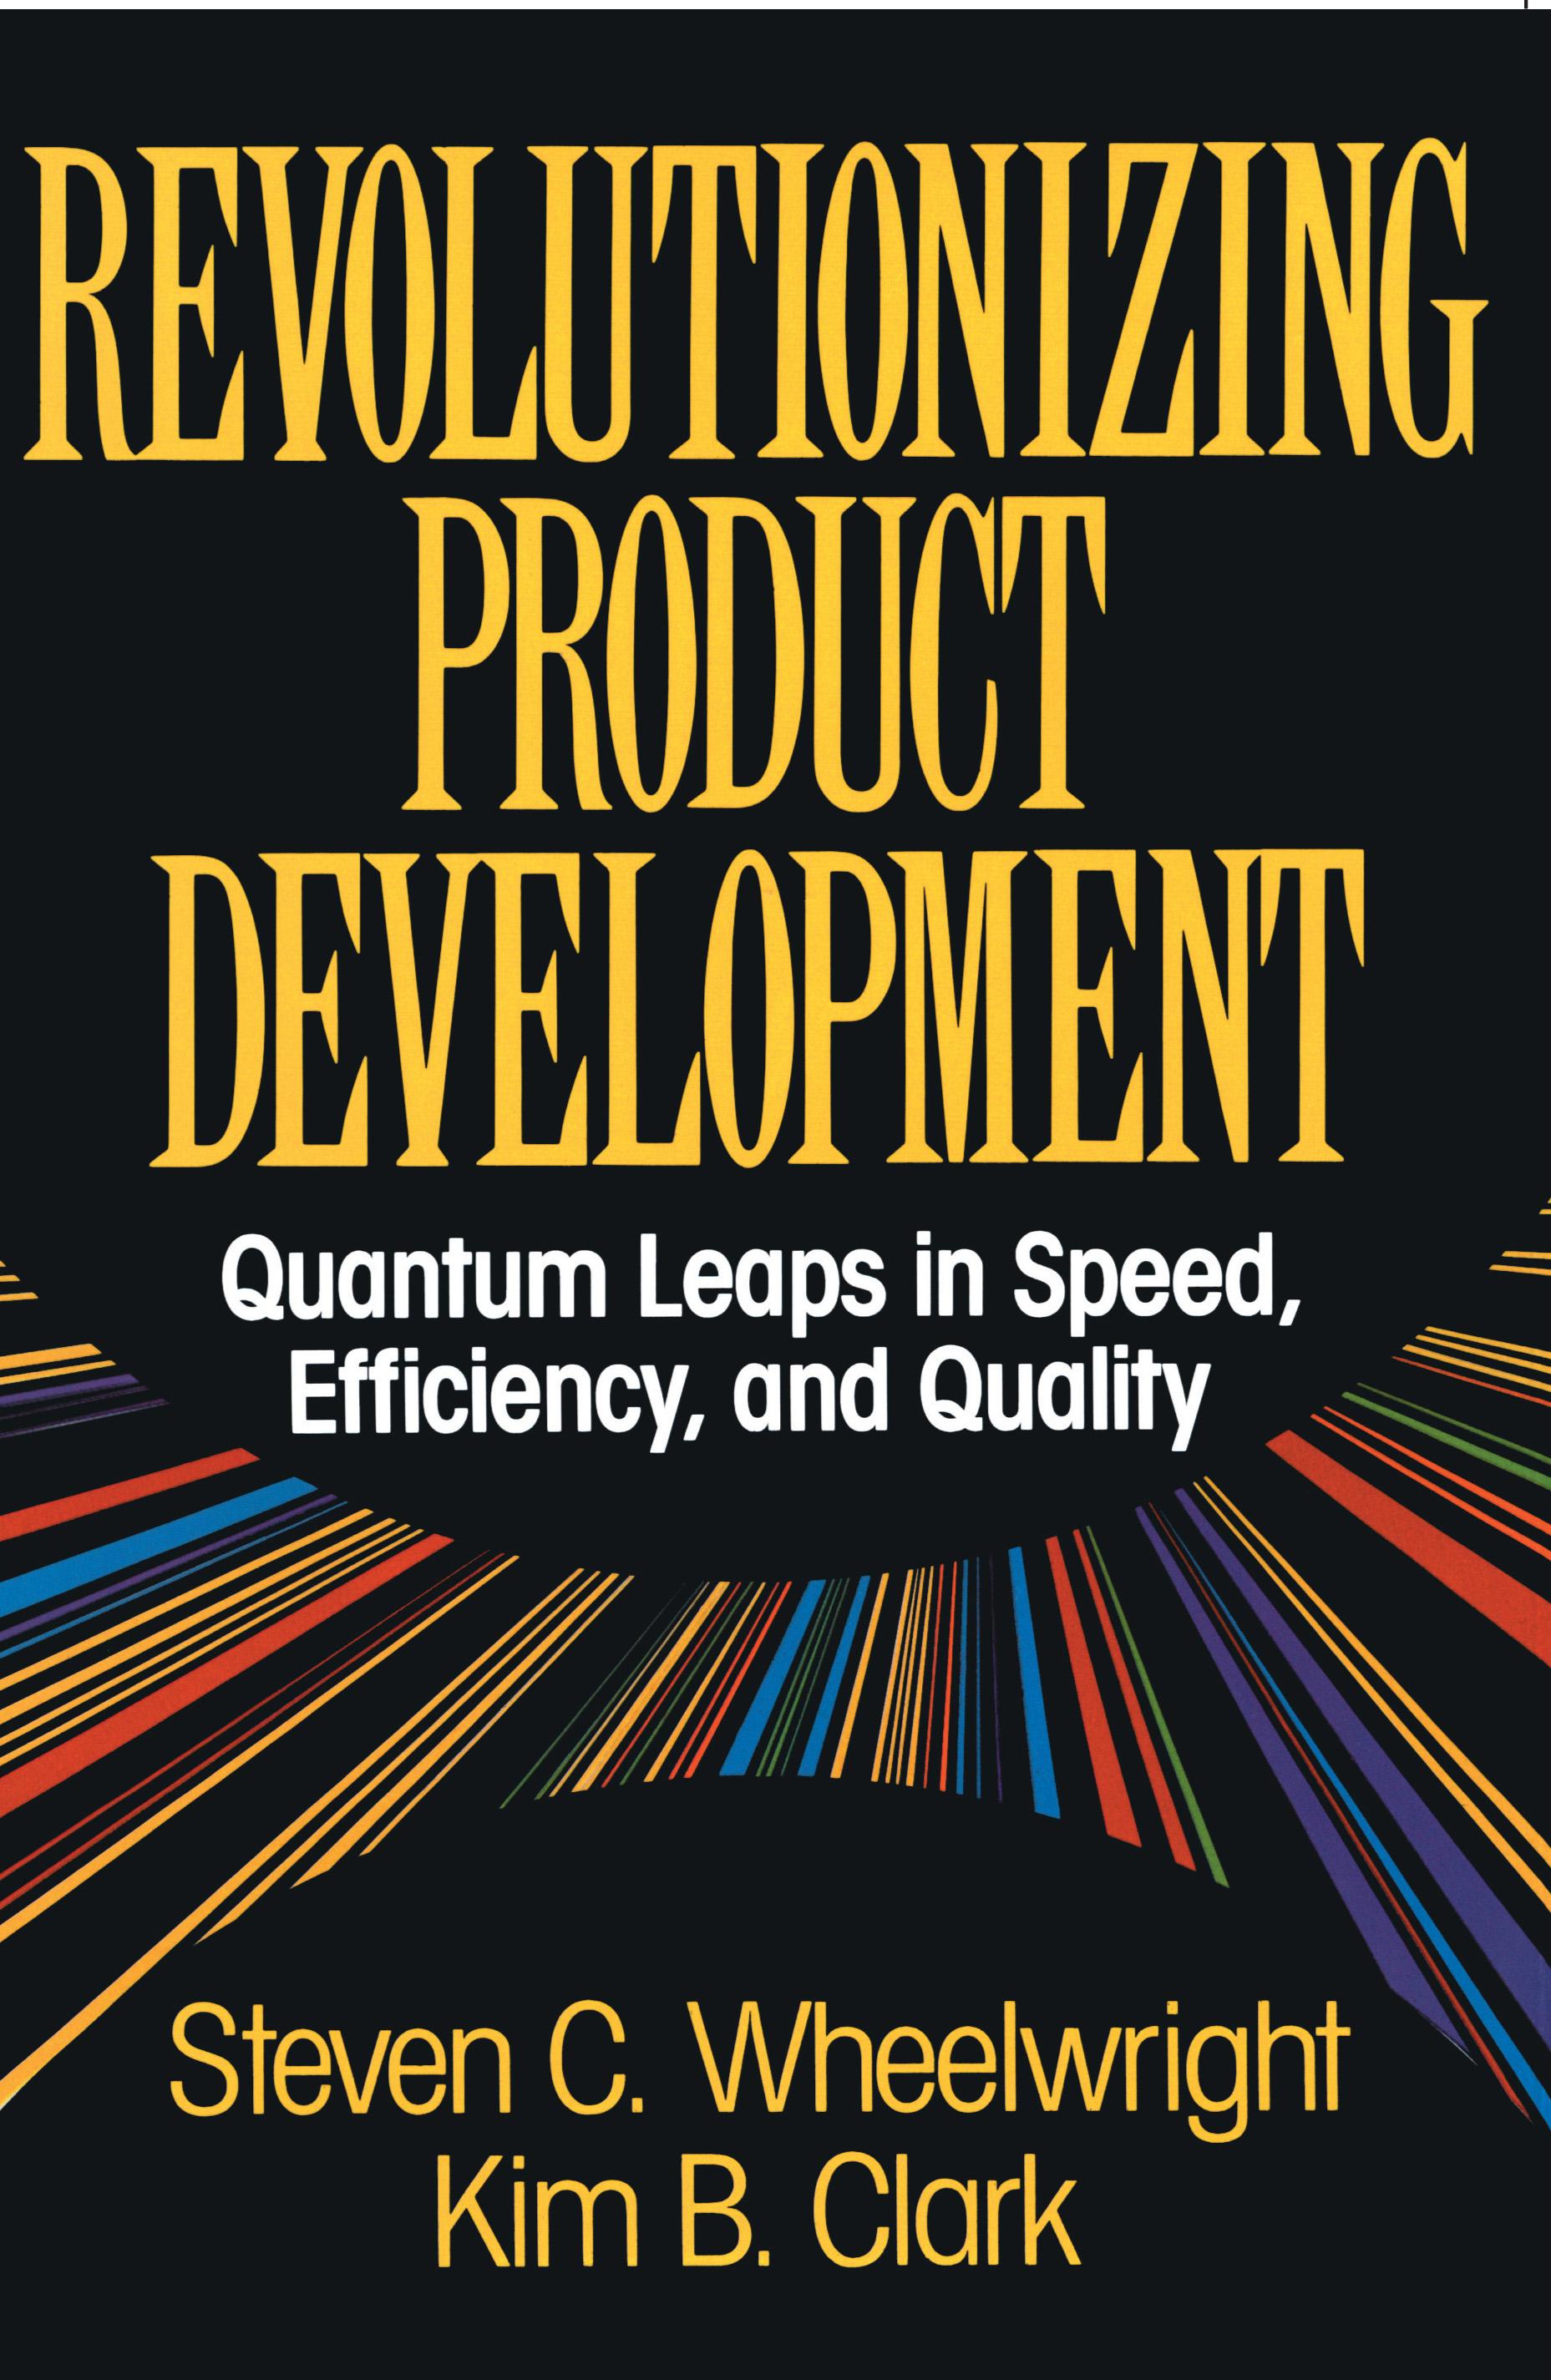 Revolutionizing product development book by steven c wheelwright cvr9781451676297 9781451676297 hr fandeluxe Images